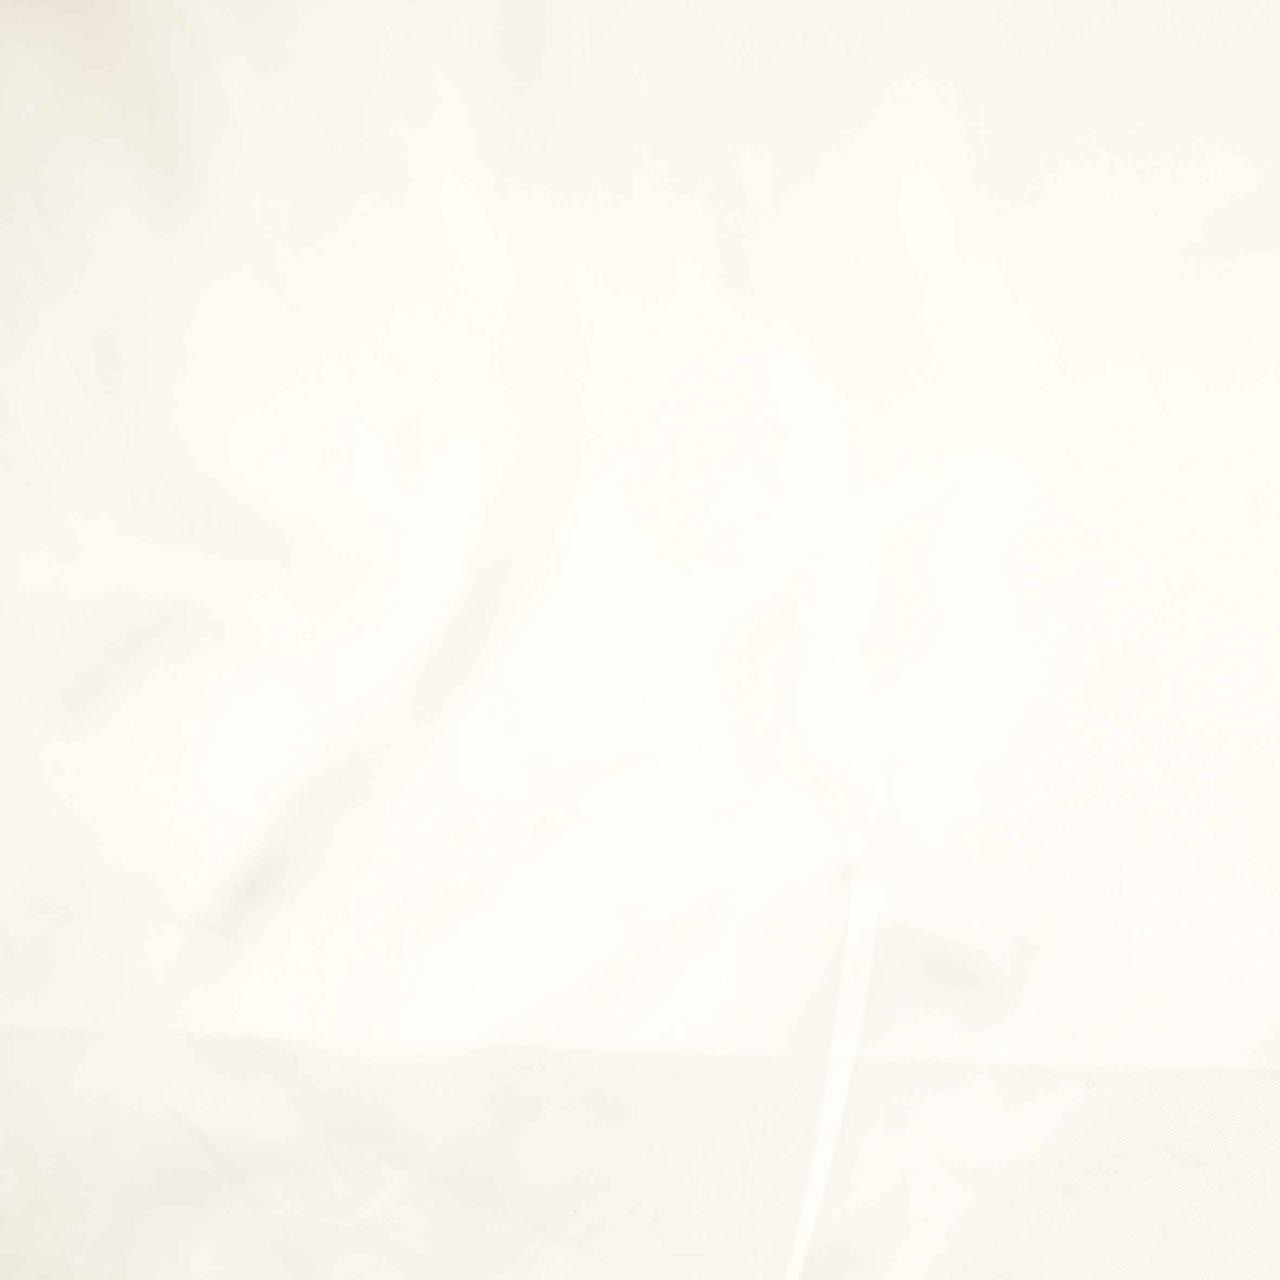 Ткань плащевка AА1 2020 23